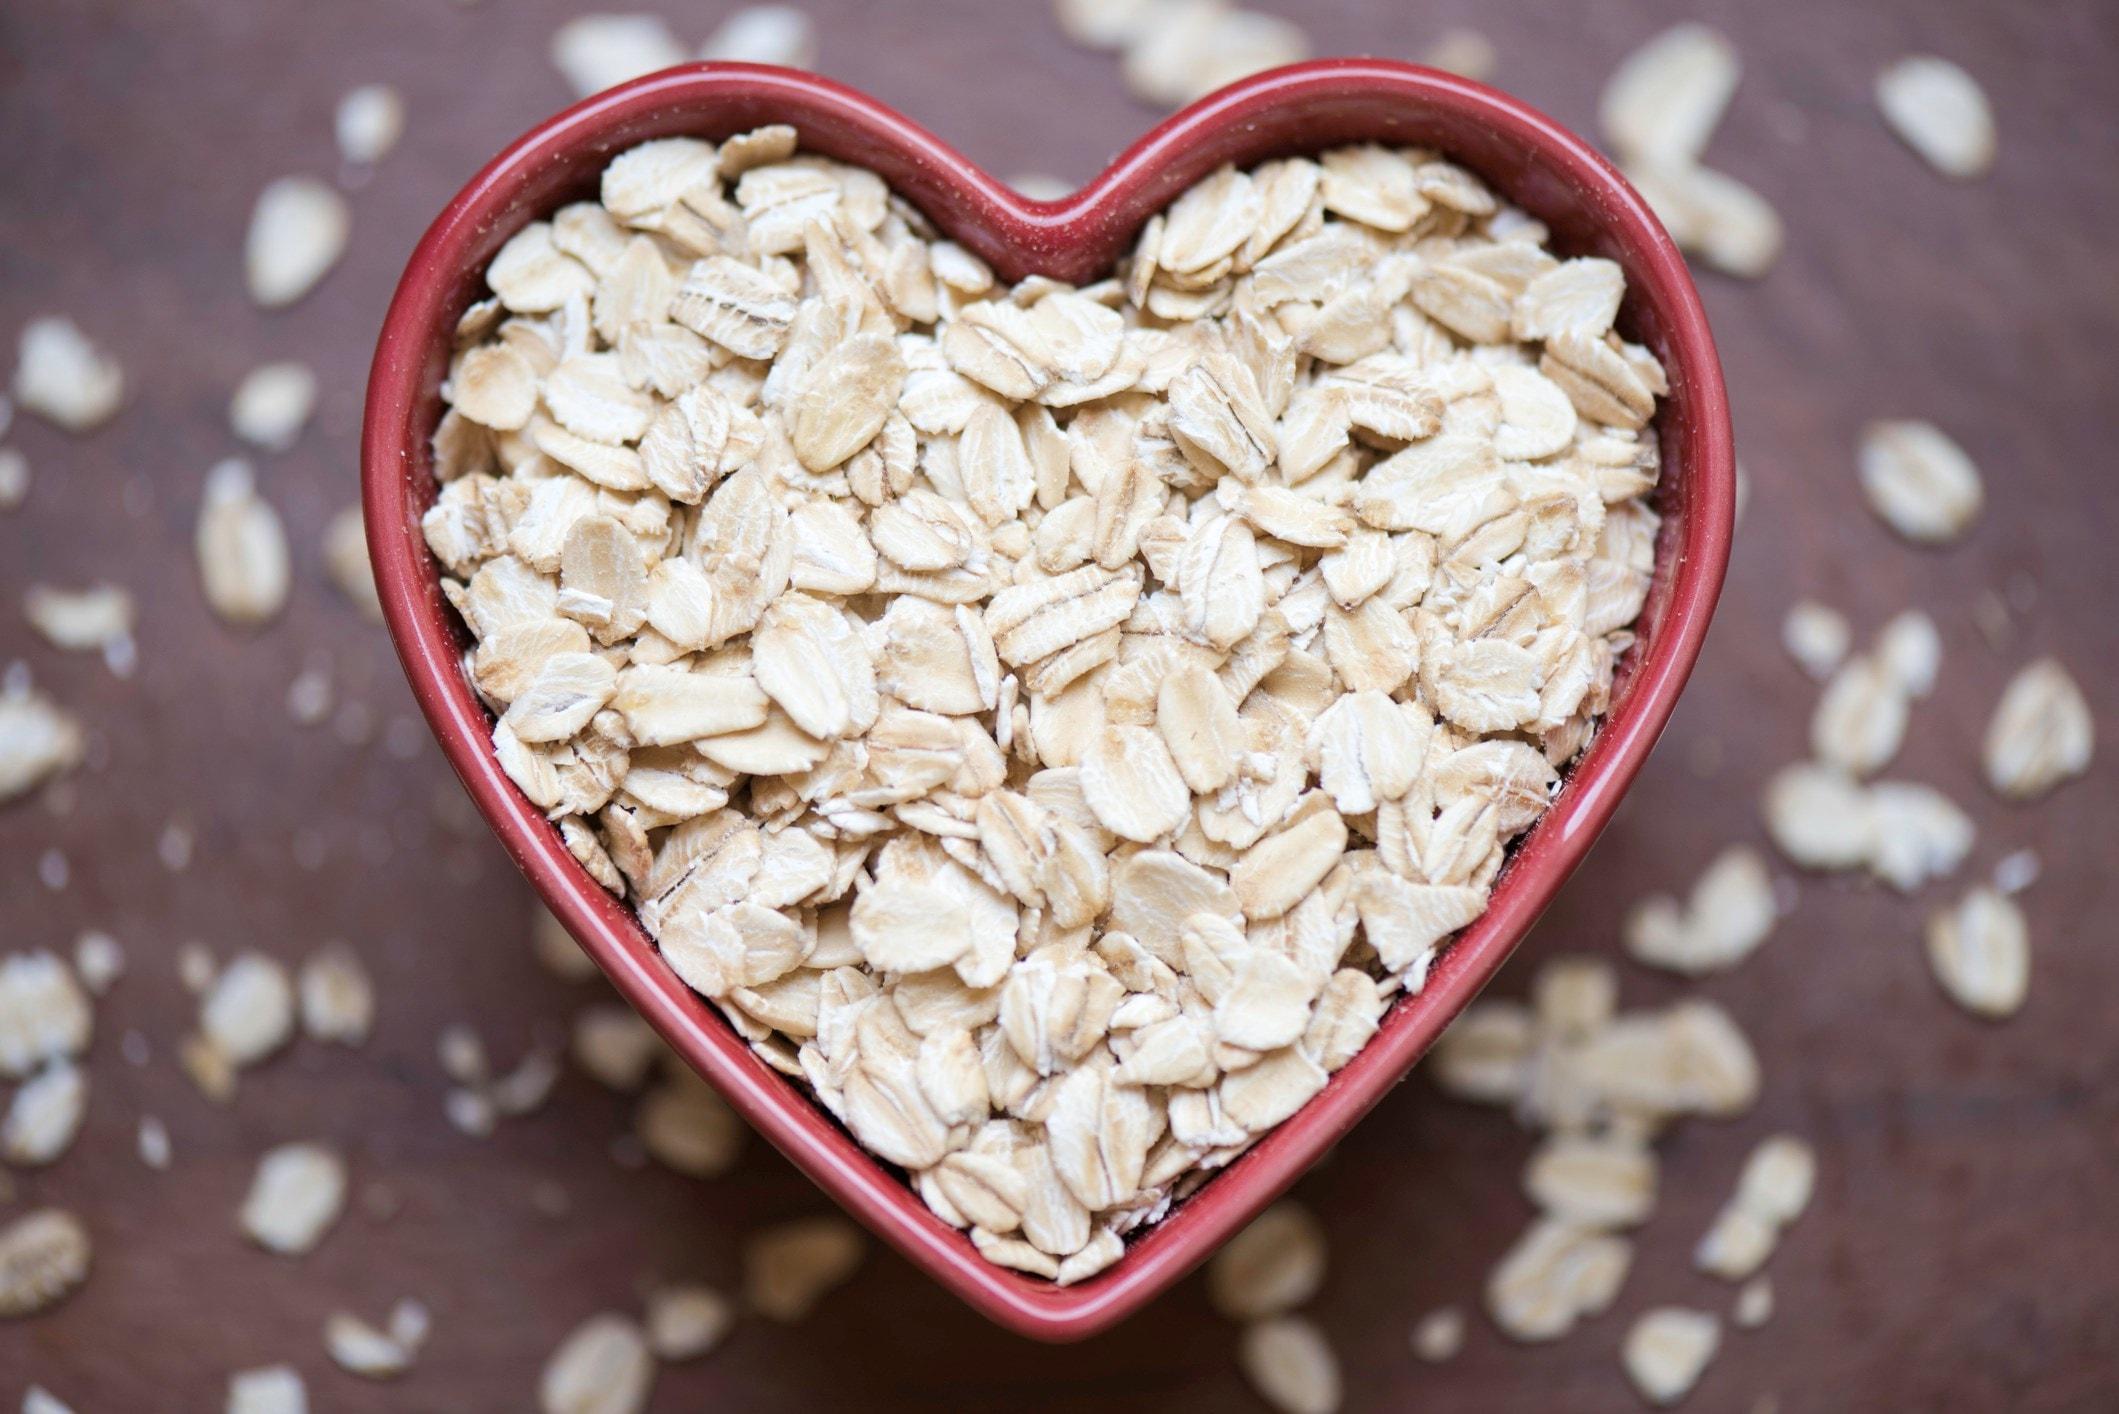 Oatmeal in a heart shaped bowl